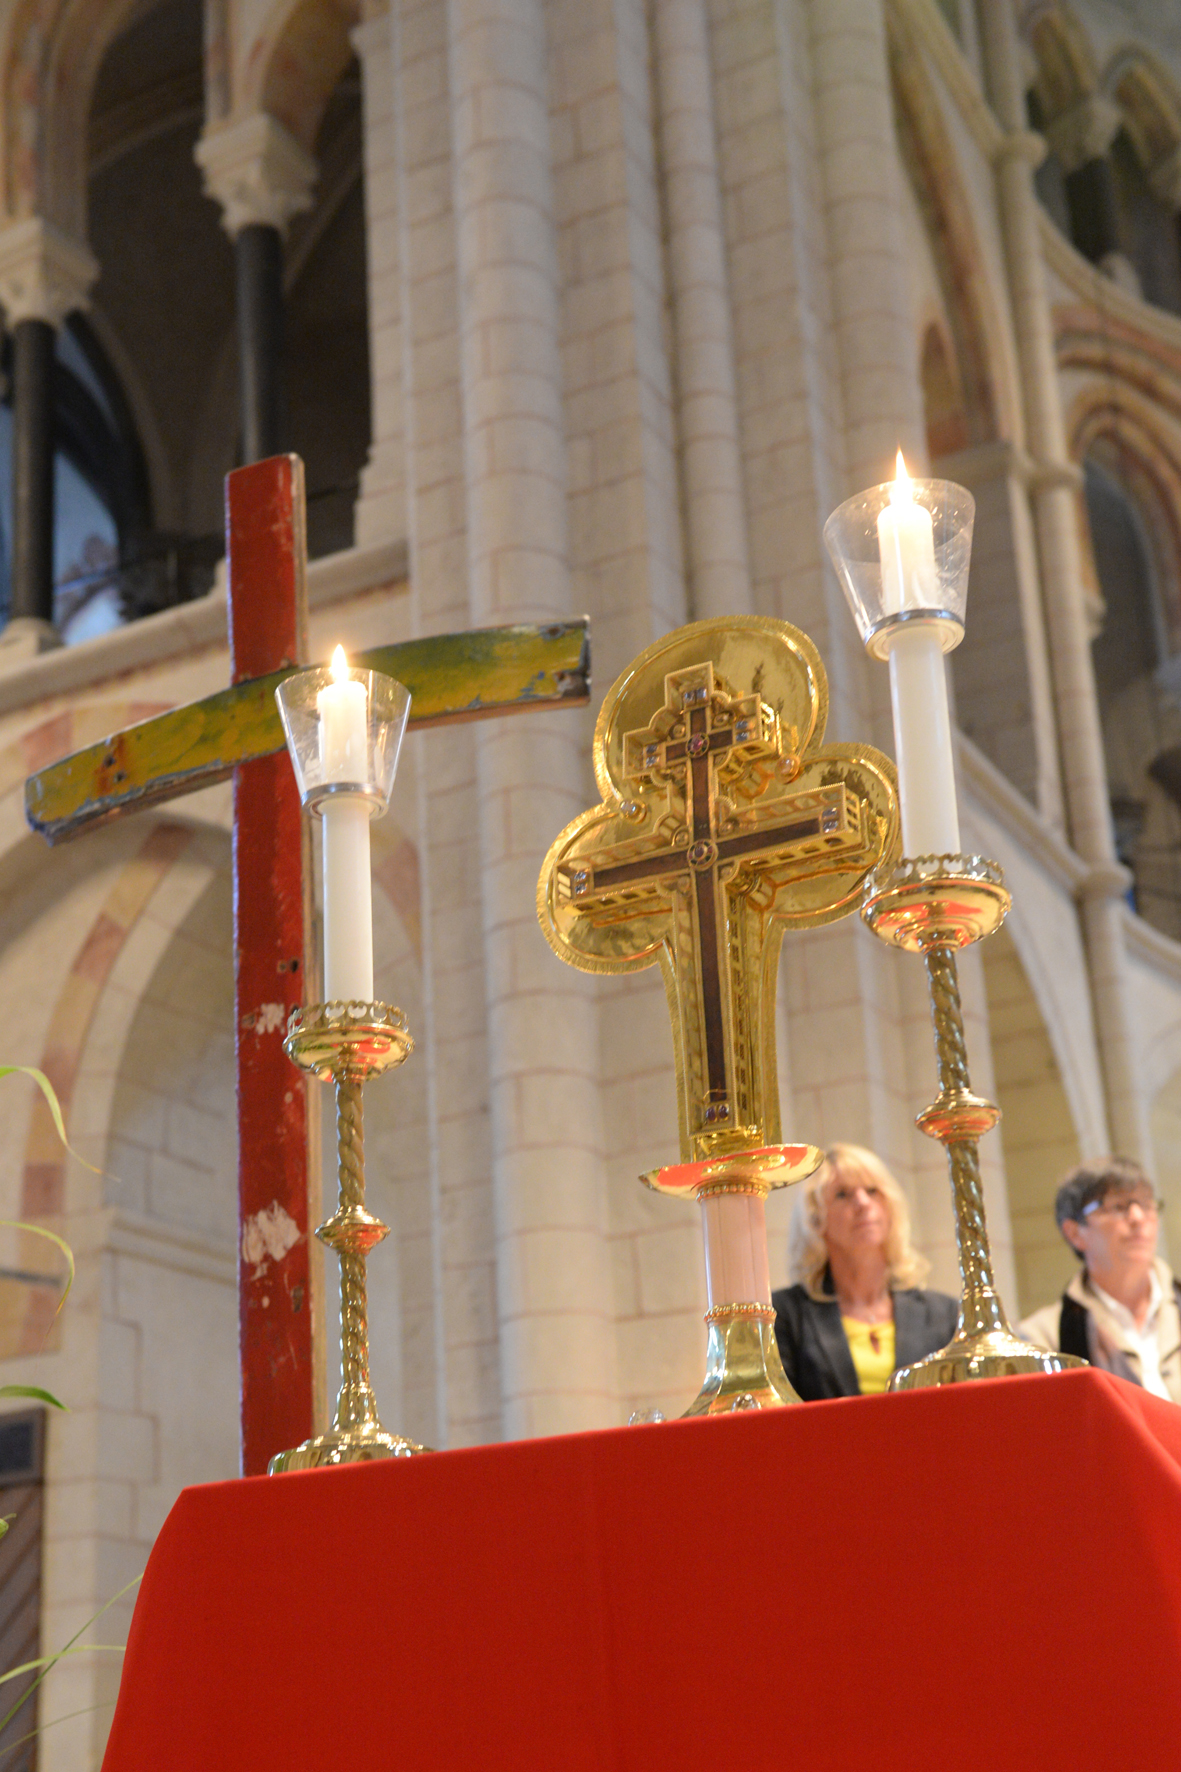 Kreuzreliqiue auf dem Altar im Limburger Dom. Bild: Bistum Limburg